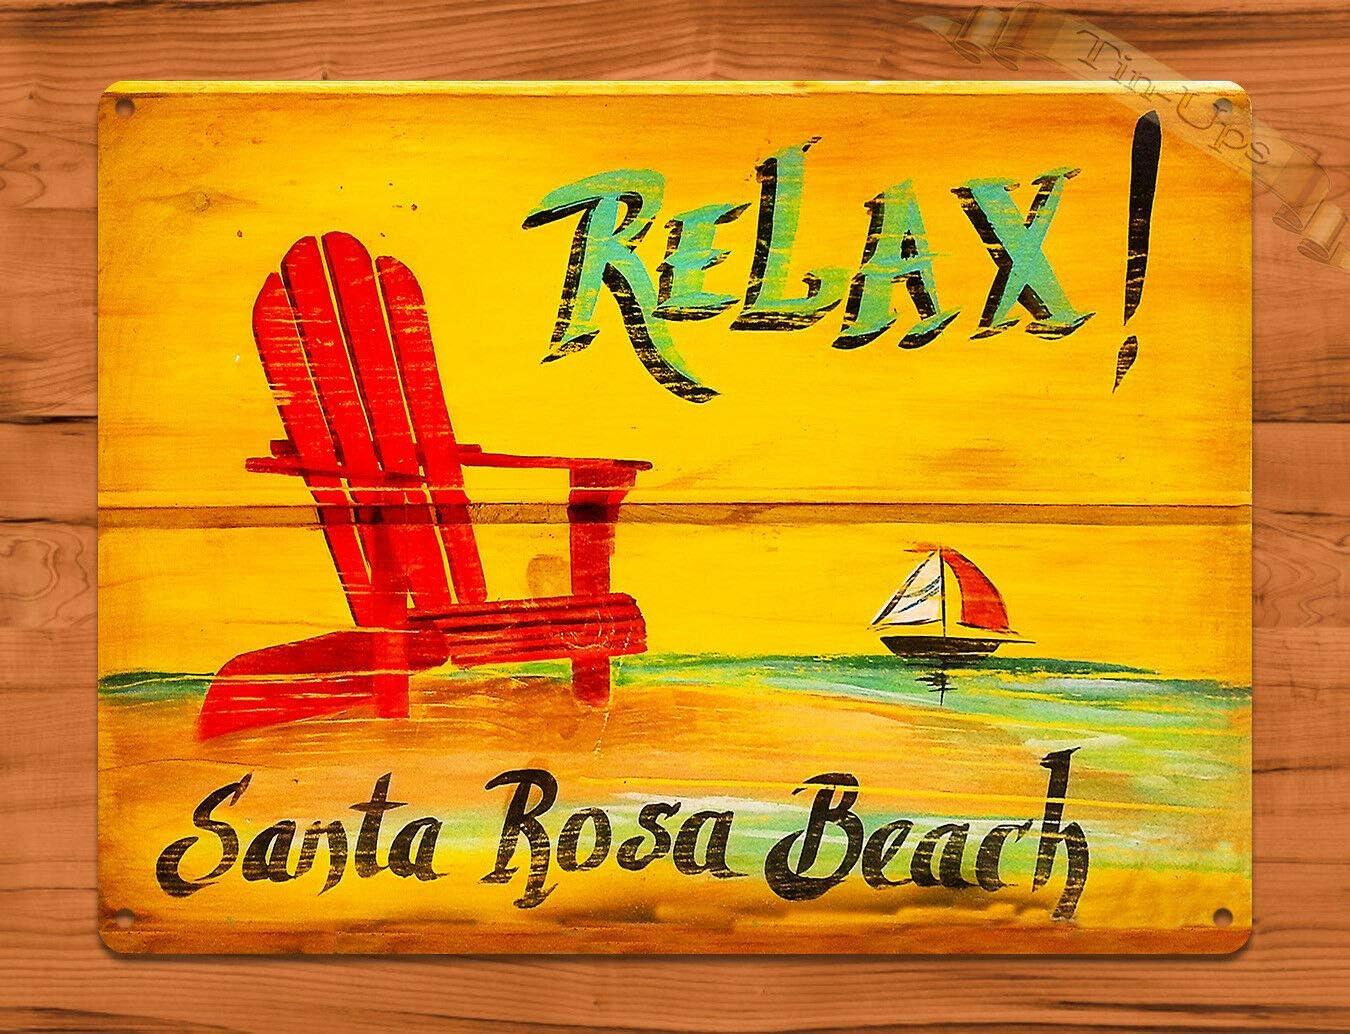 AMELIA SHARPE Metal Vintage Tin Signs Relax! Santa Rosa Beach Florida Ocean Bay Decorative Tin Sign Home Bar Restaurant Wall Decoration Sign 12X8Inch